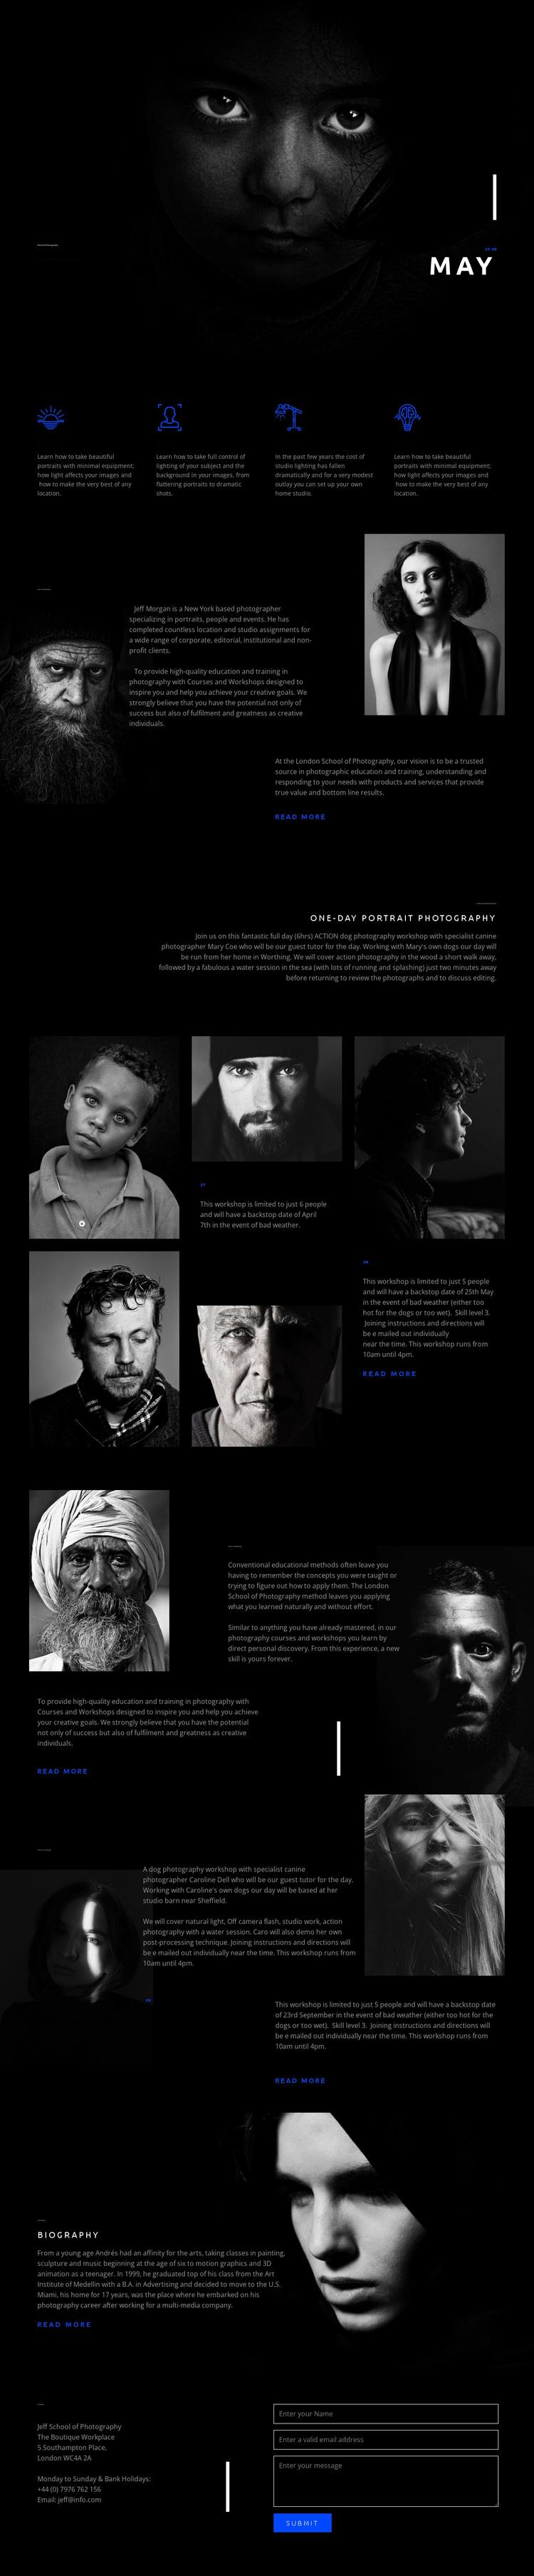 Amazing portrait art Joomla Page Builder